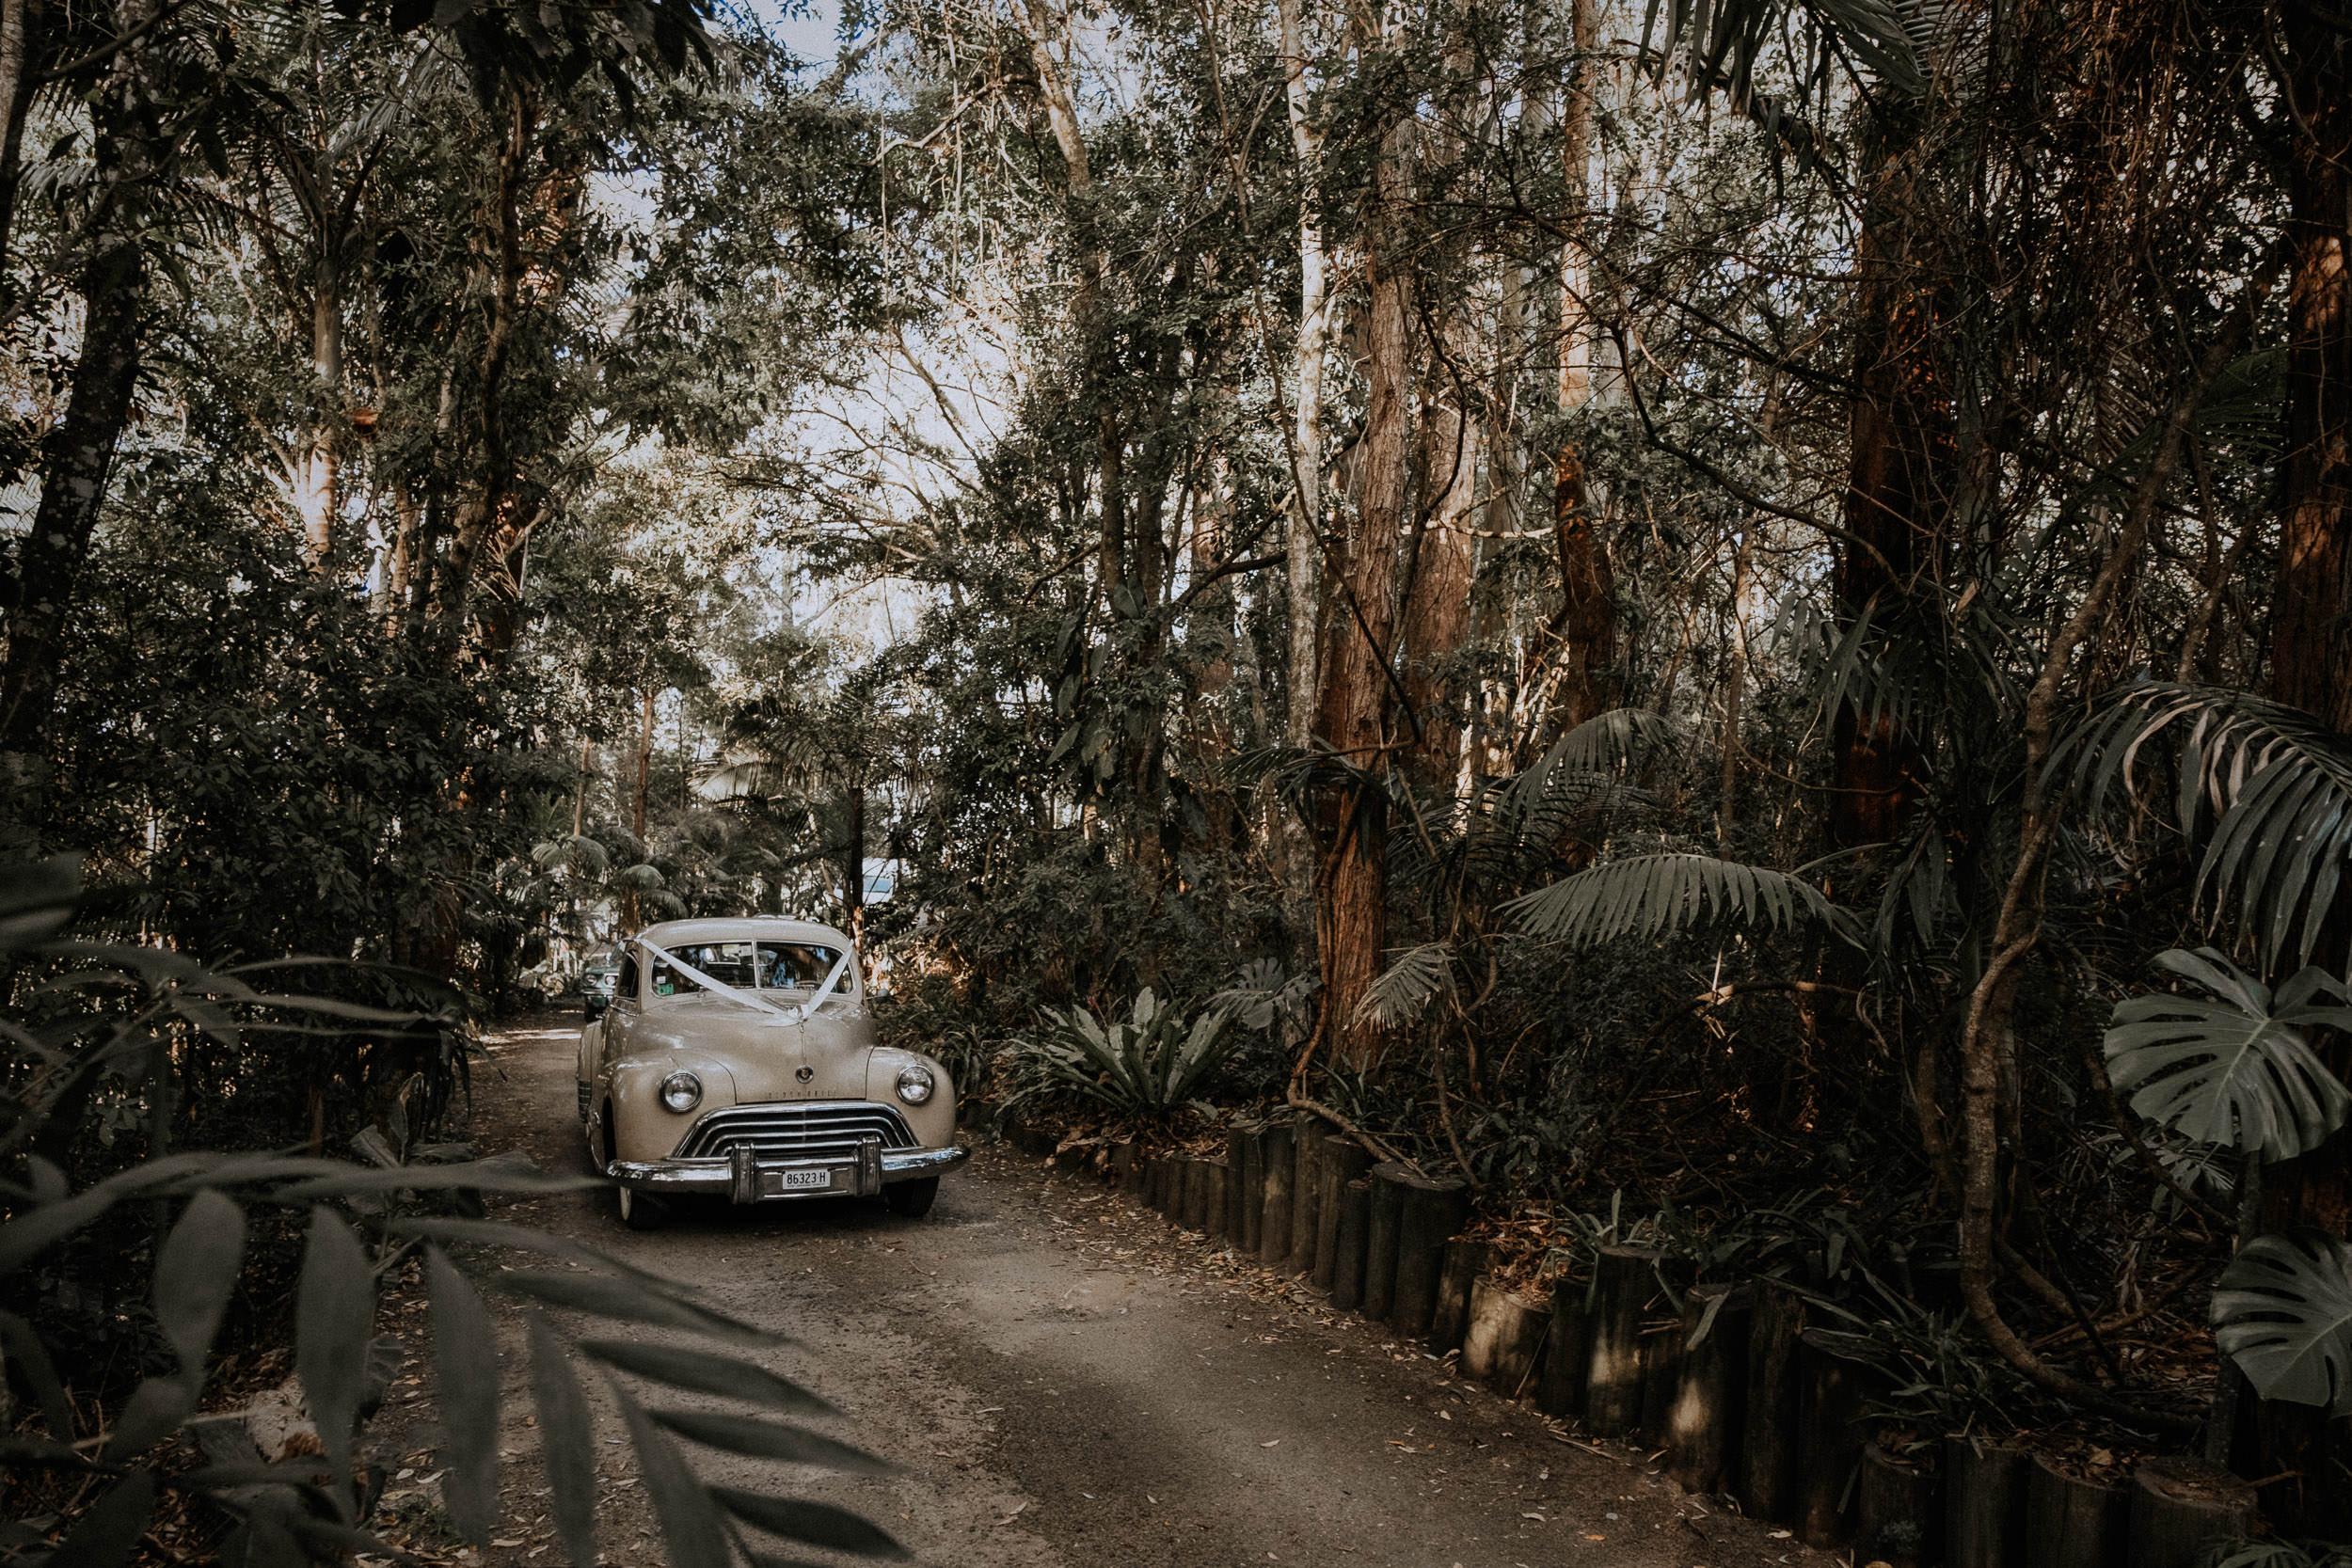 S&A Elopement - Kings & Thieves - Shred 'Til Dead - Central Coast Beach Forest Wedding - 140.jpg